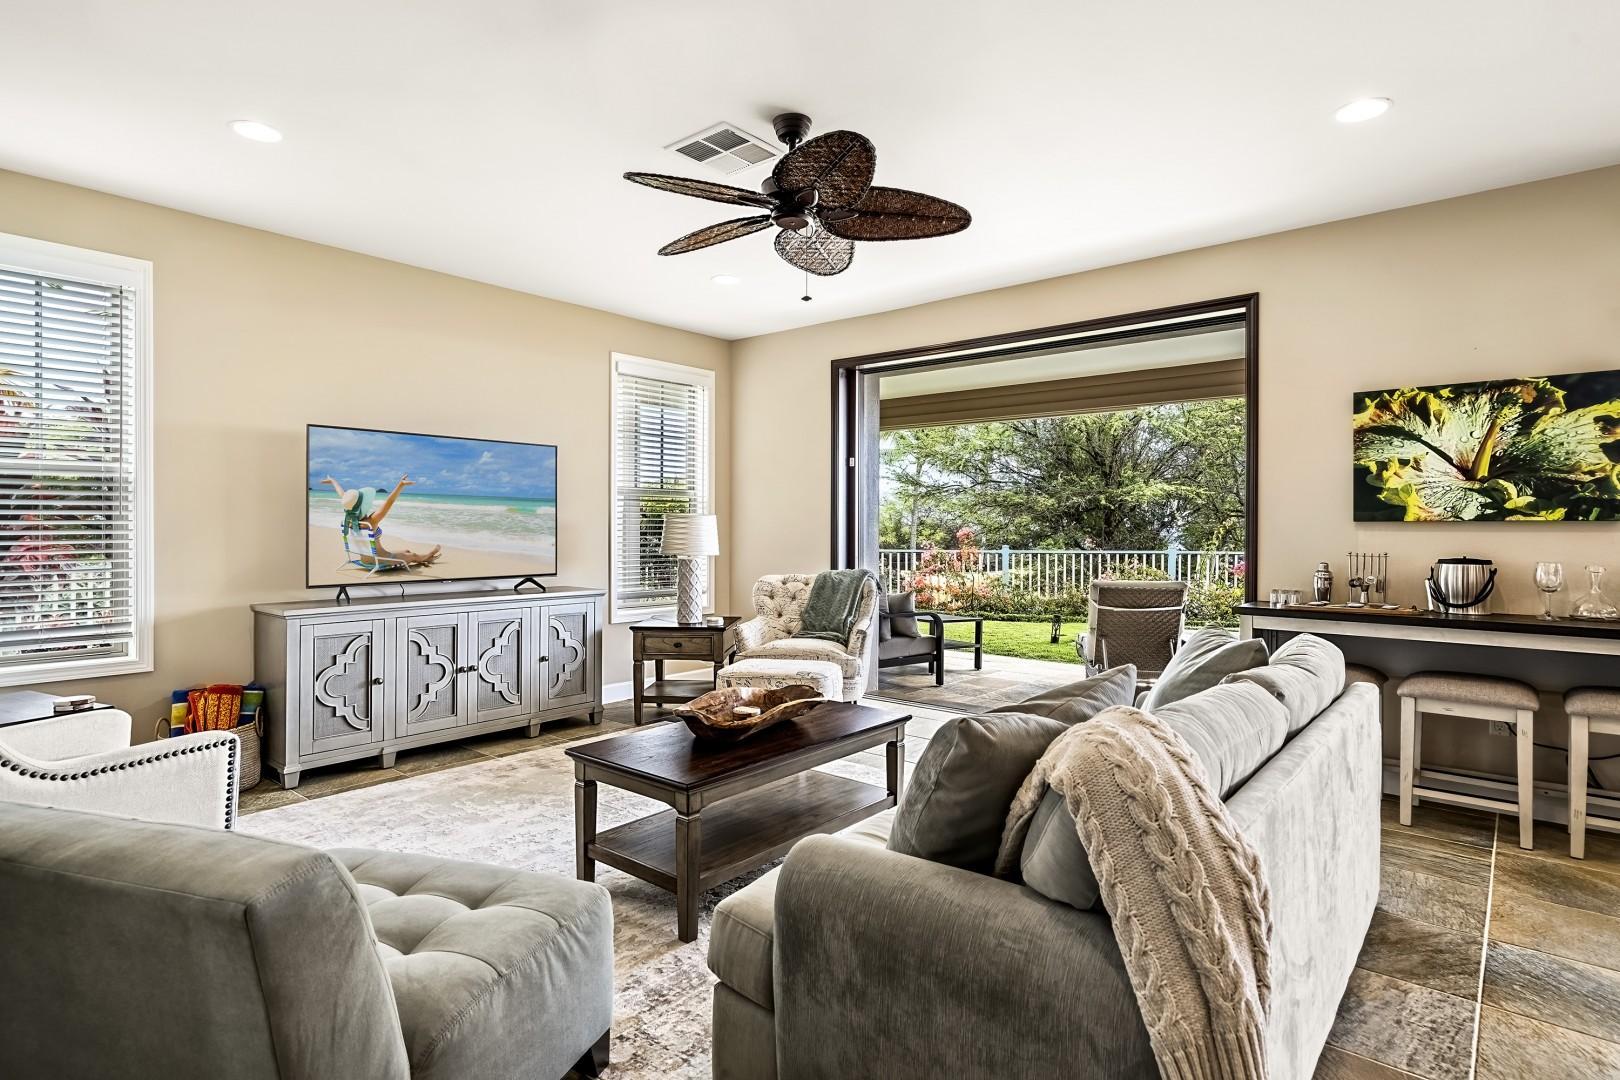 Sliding doors open to embrace the Hawaiian breezes